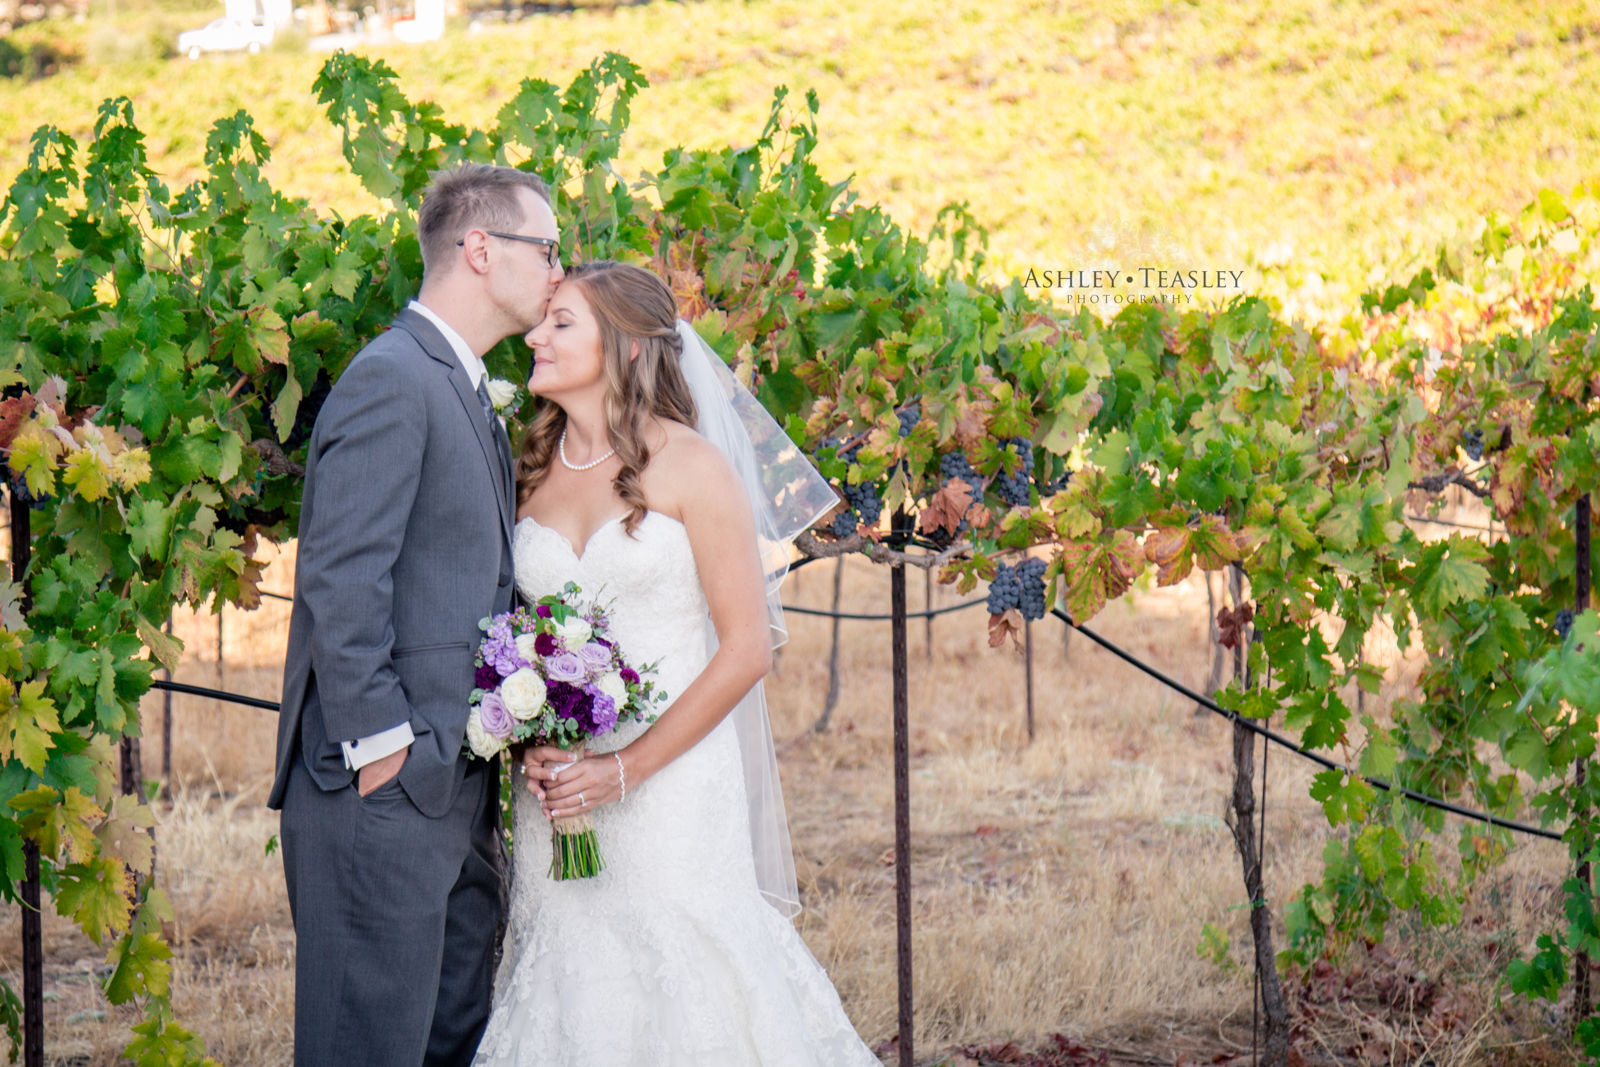 Ashley Teasley Photography - Amador Cellars Winery - Sacramento Wedding Photographer-128.JPG